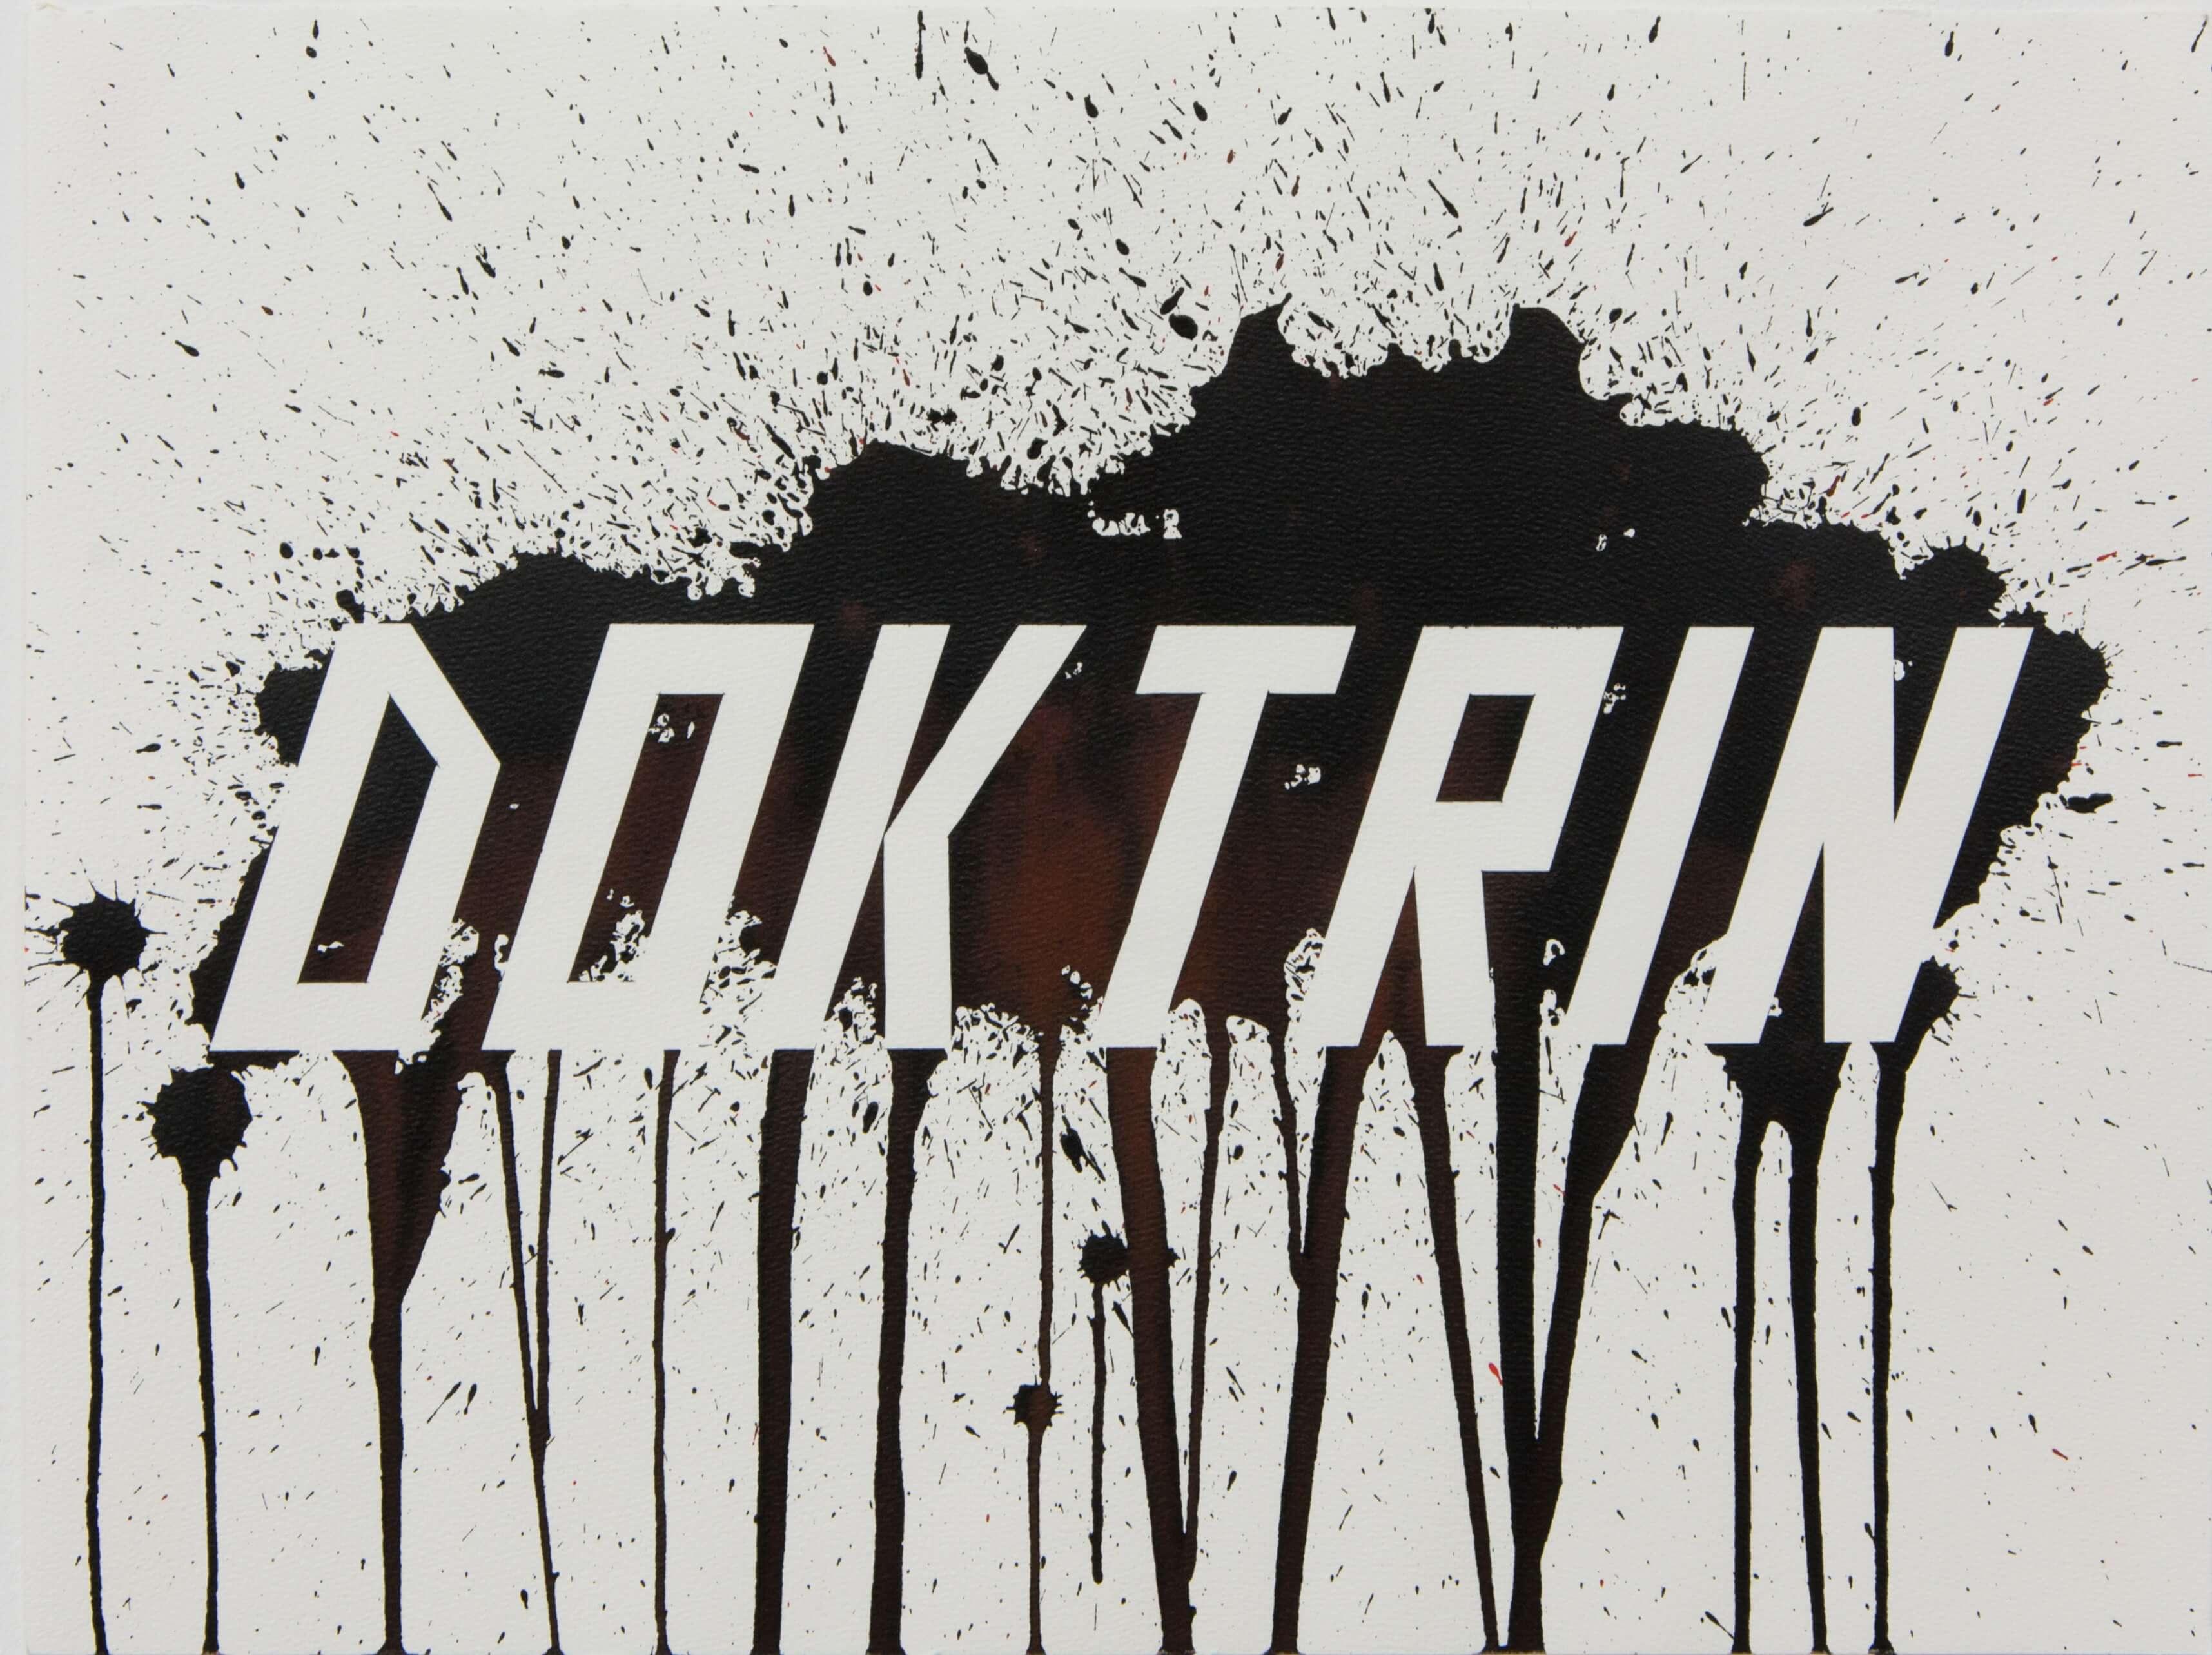 Lars Breuer Doktrin Tusche Aquarell Papierarbeit 2014 Addaux Artist Bielefeld Berlin Düsseldorf Grafik Schrift Galerie